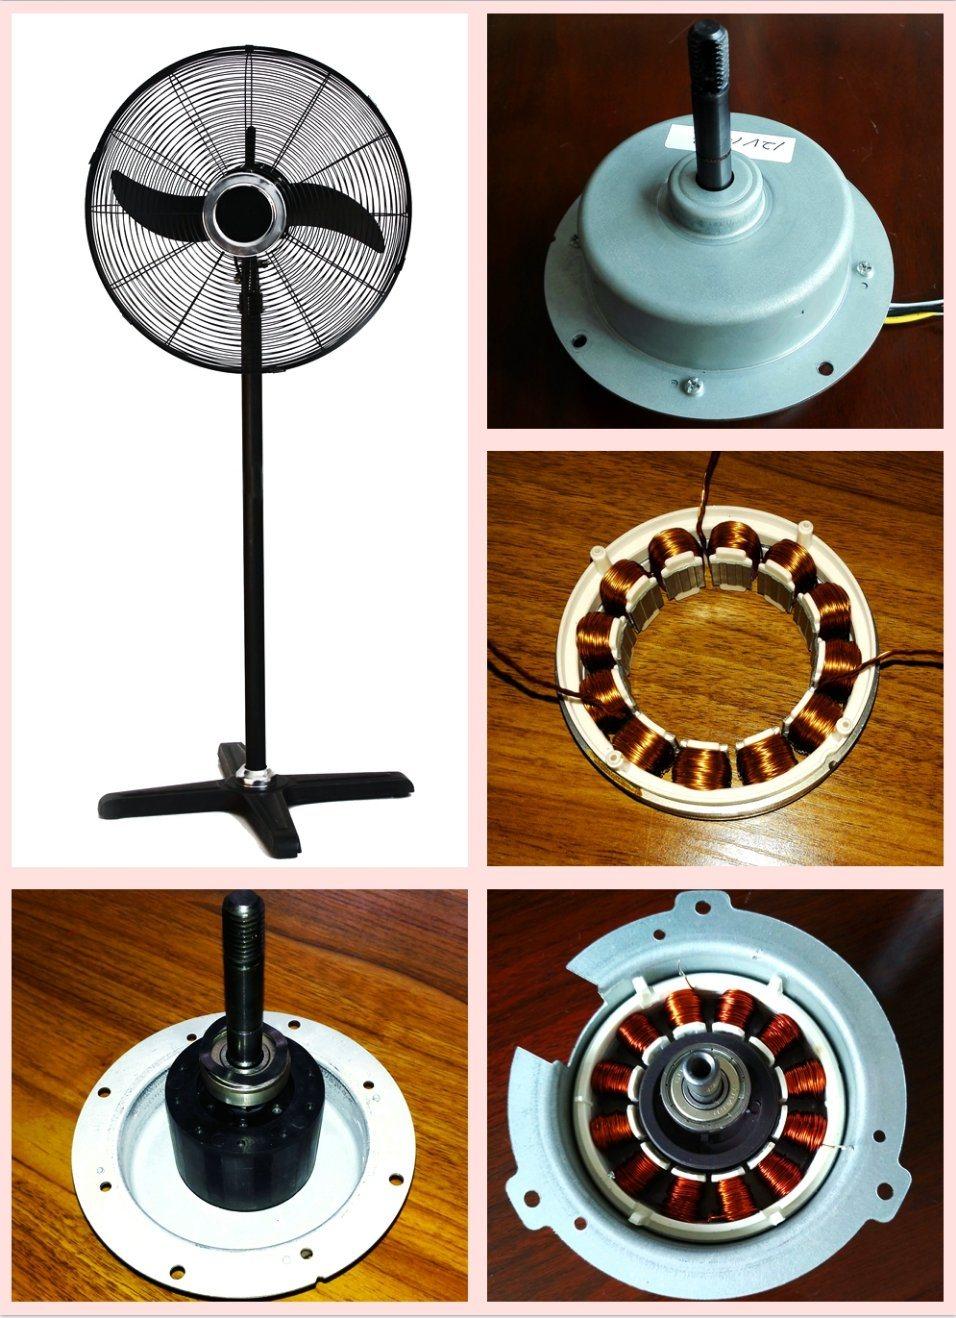 500mm 650mm 750mm Inverter DC Motor Industry Pedestal Fan with Aluminium Blades